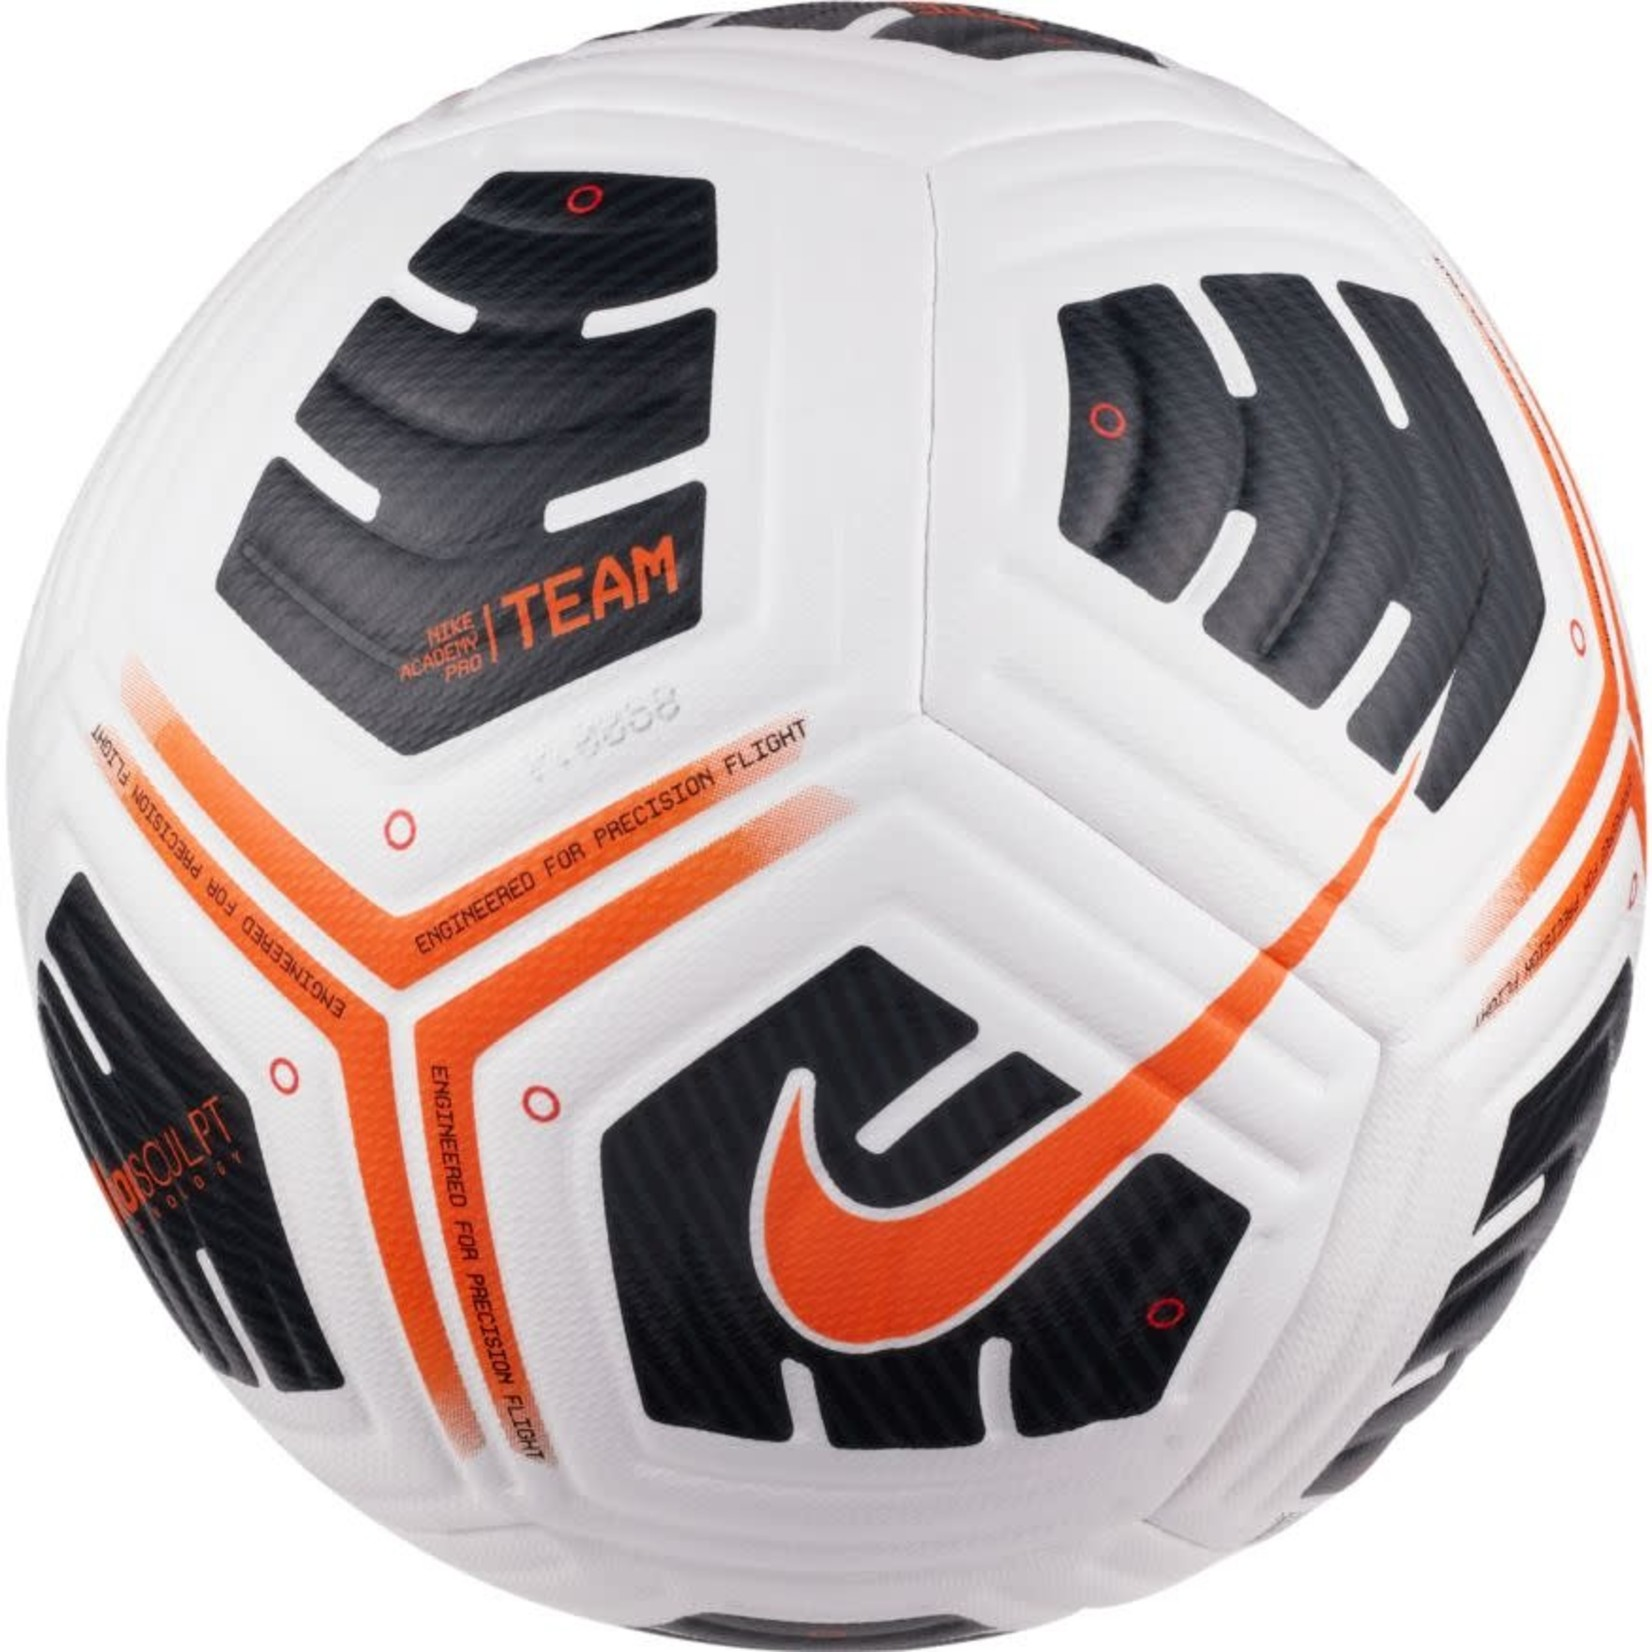 NIKE ACADEMY PRO TEAM BALL (WHITE/BLACK/ORANGE)